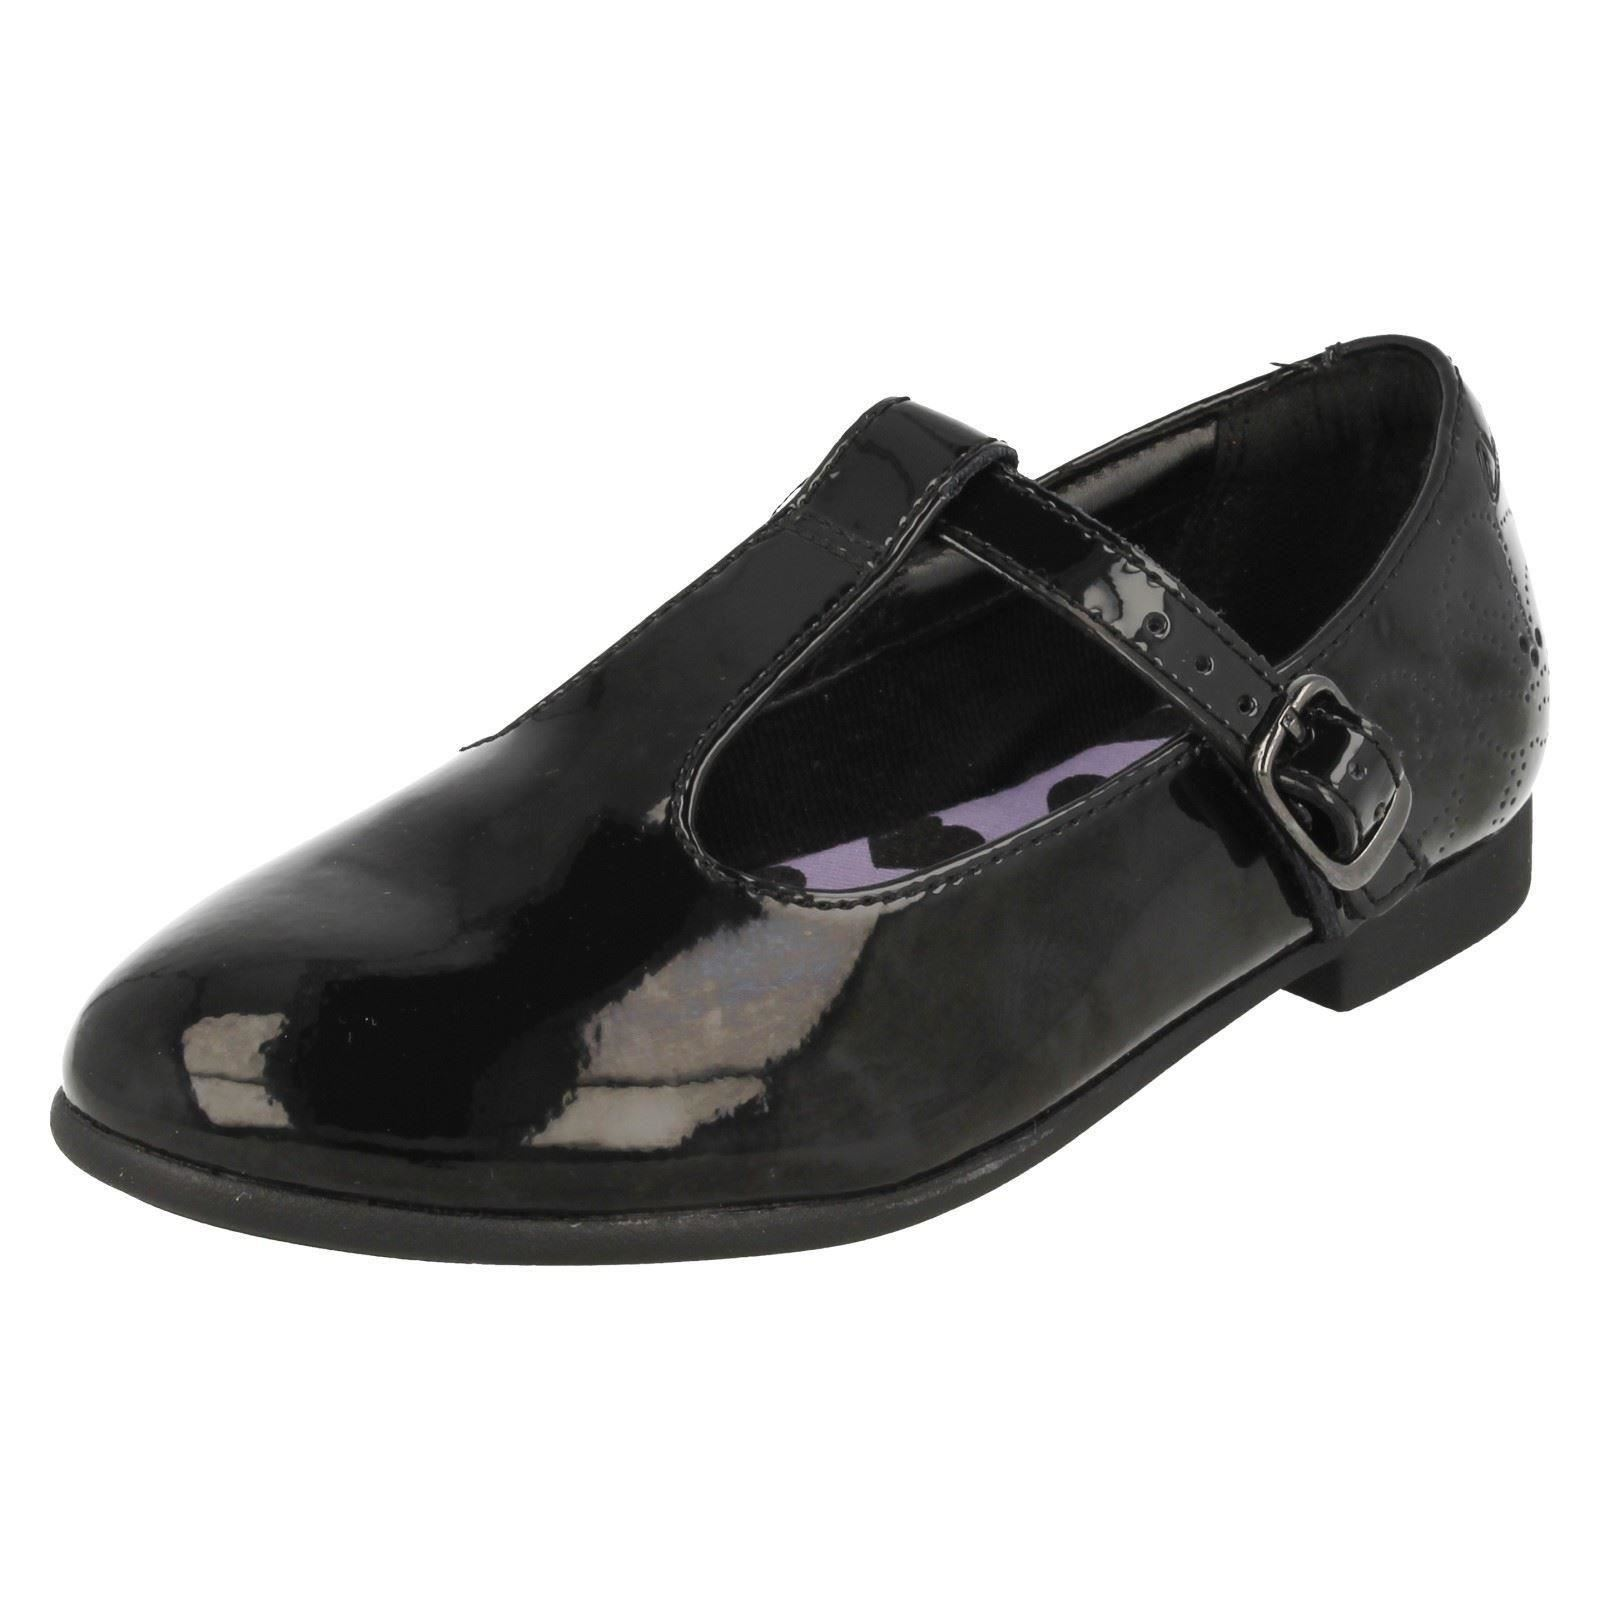 Clarks Niñas T-Bar Inteligente Escuela Zapatos-Selsey Fudge